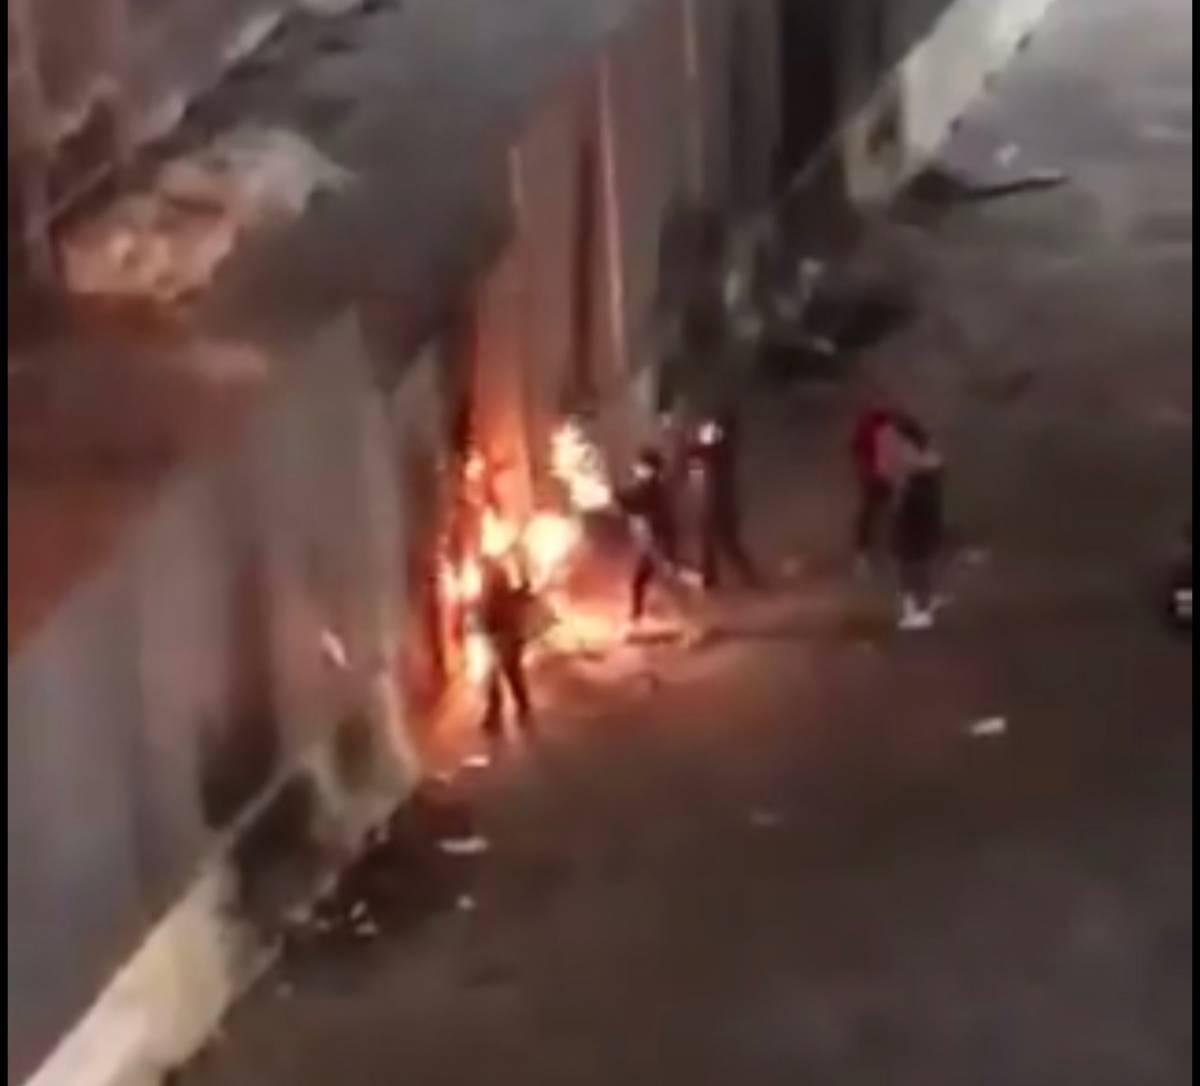 Baby gang appicca incendio fuori da una chiesa in piazza Sanità